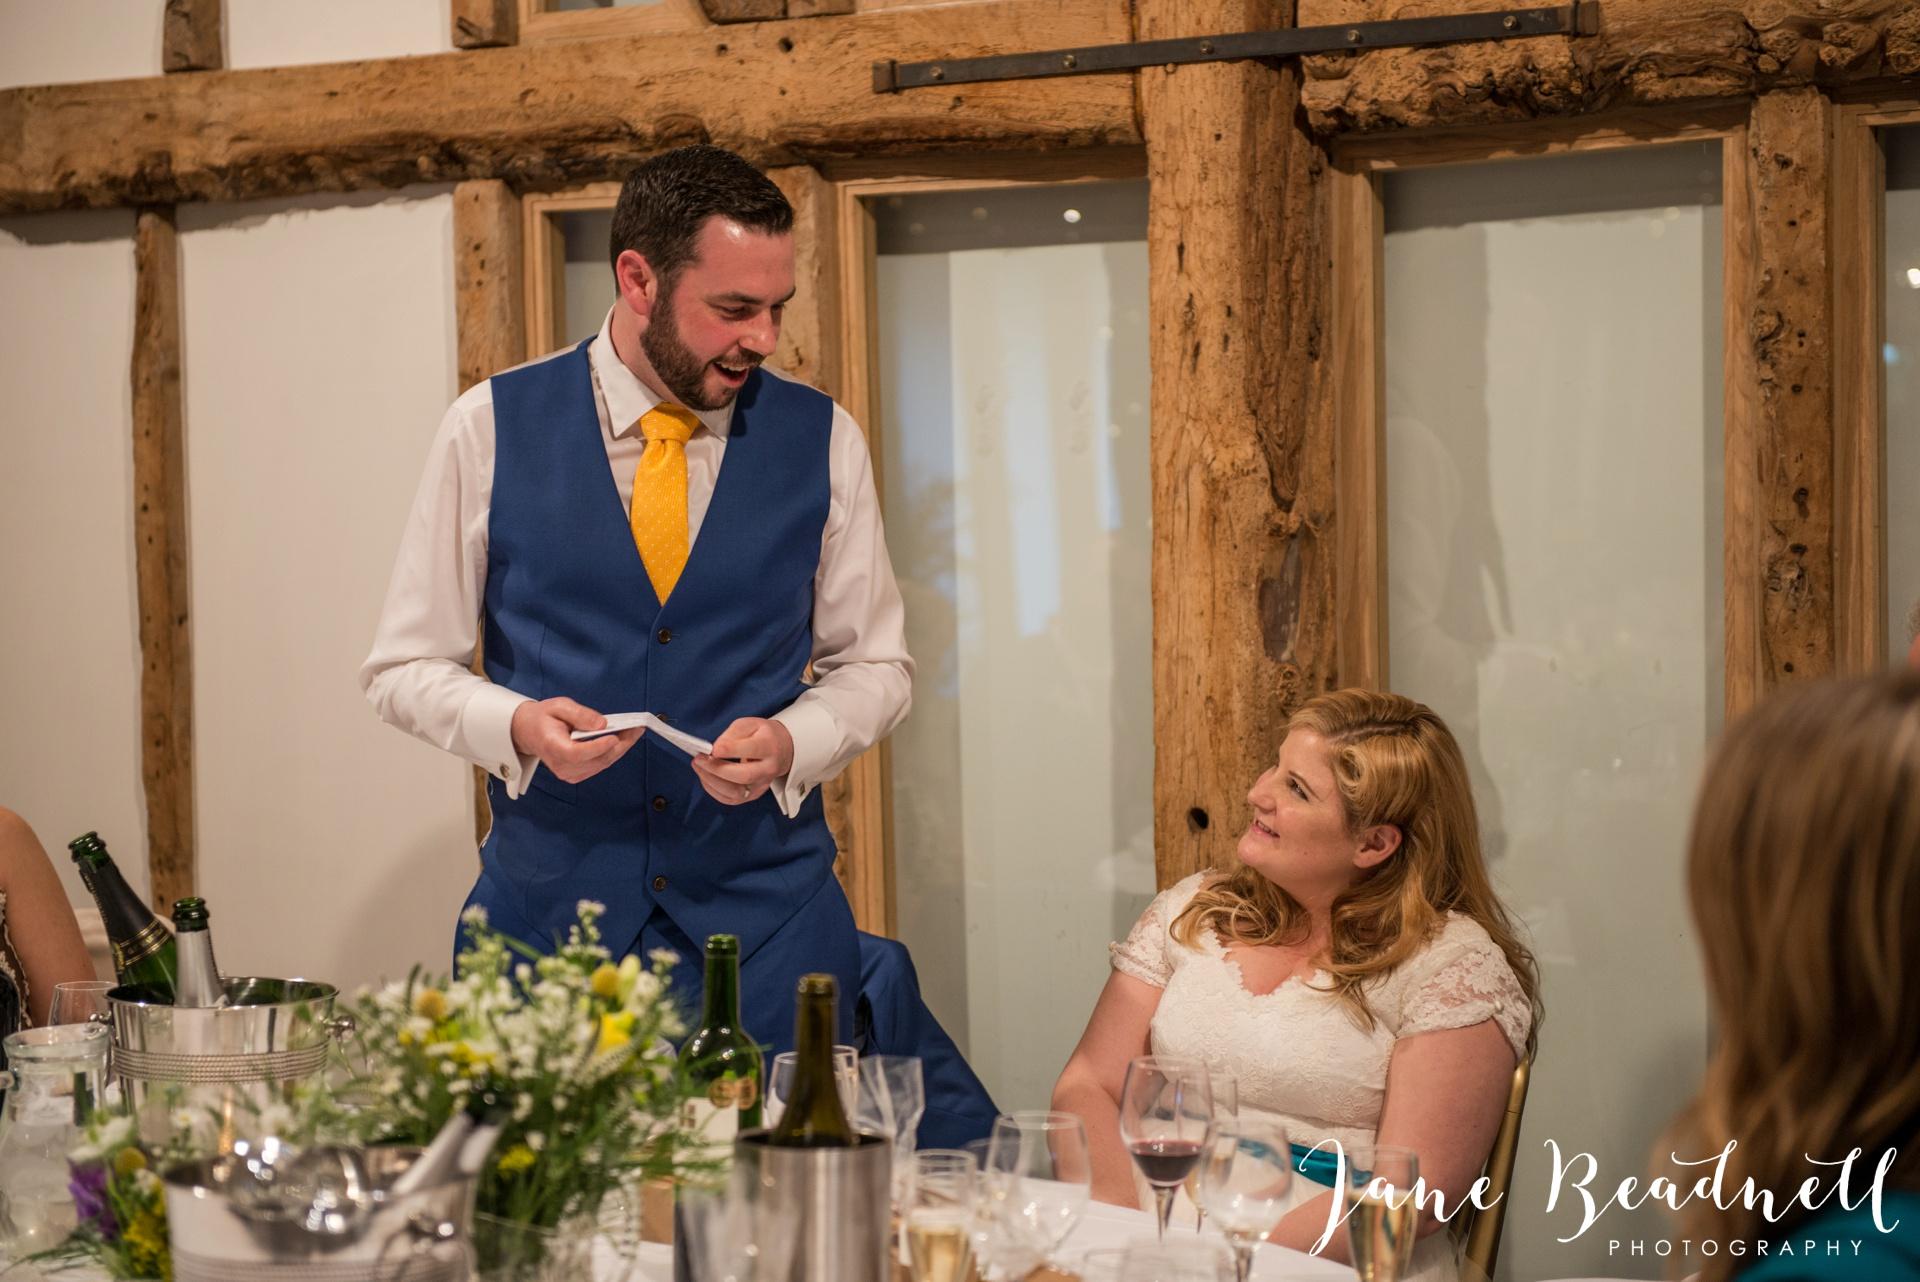 South Farm Wedding photography Hertfordshire by Jane Beadnell Photography fine art wedding photographer_0203